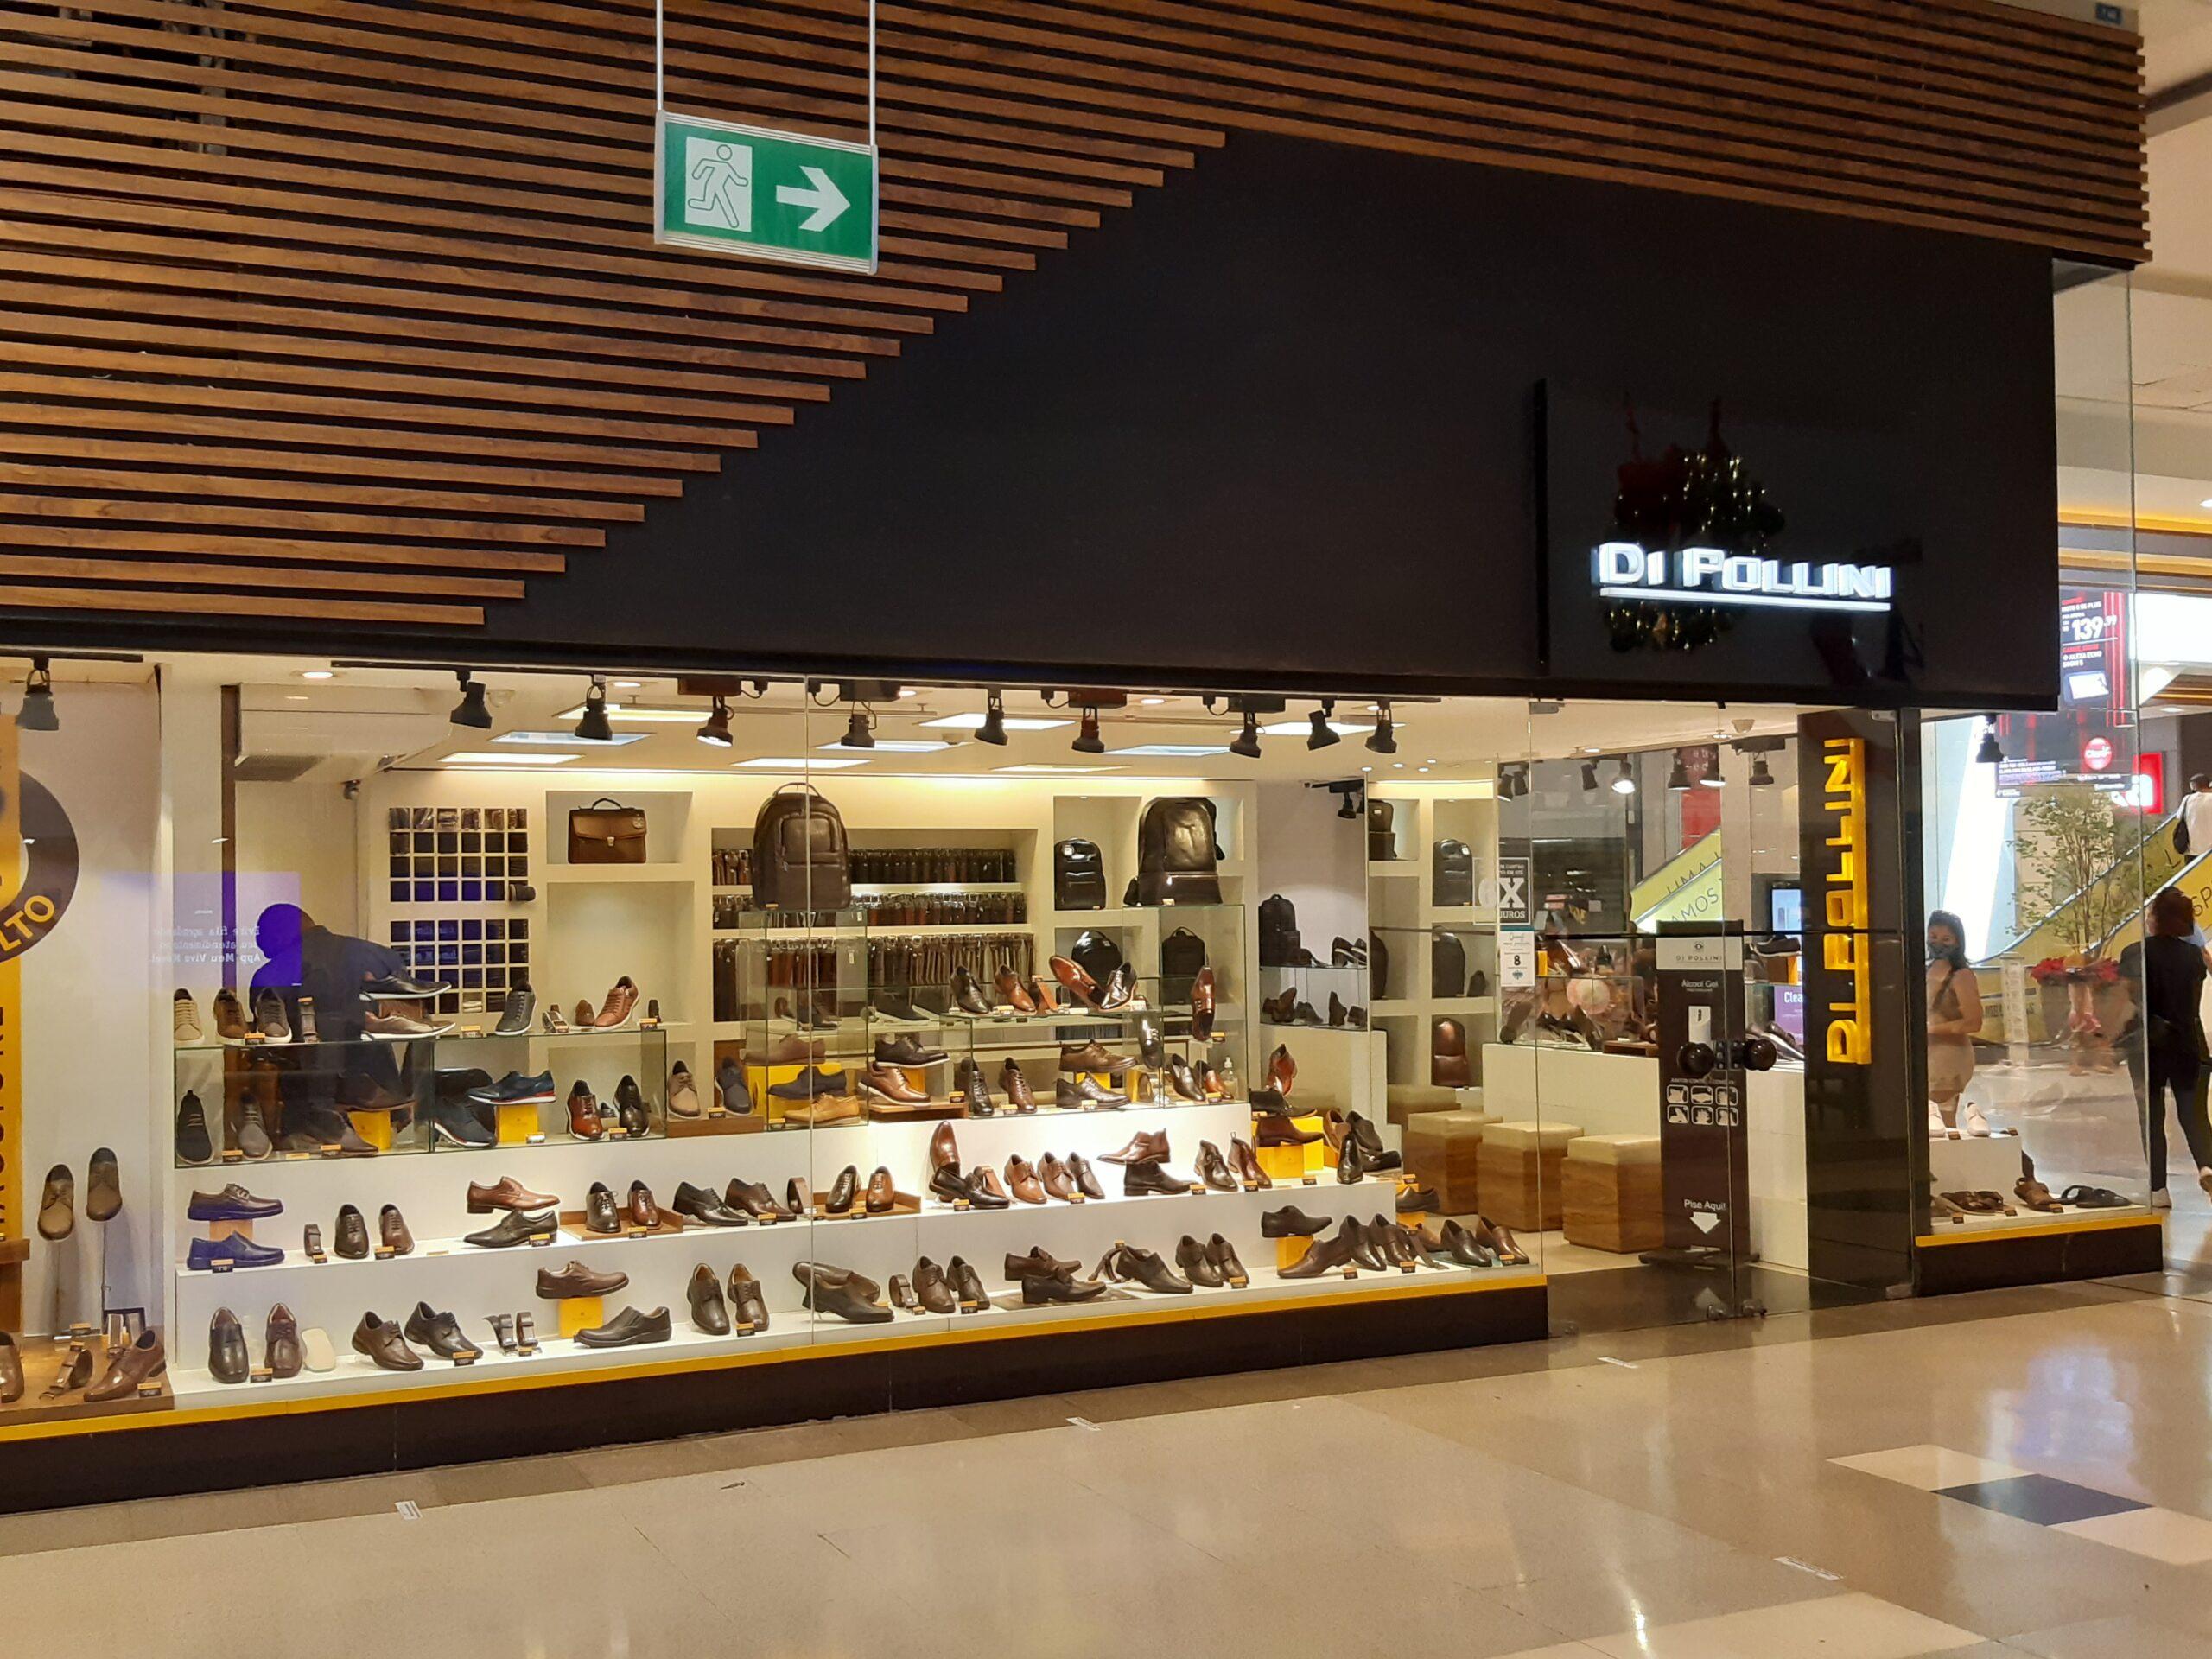 Di Pollinni Calçados do Shopping Conjunto Nacional, 1º Piso